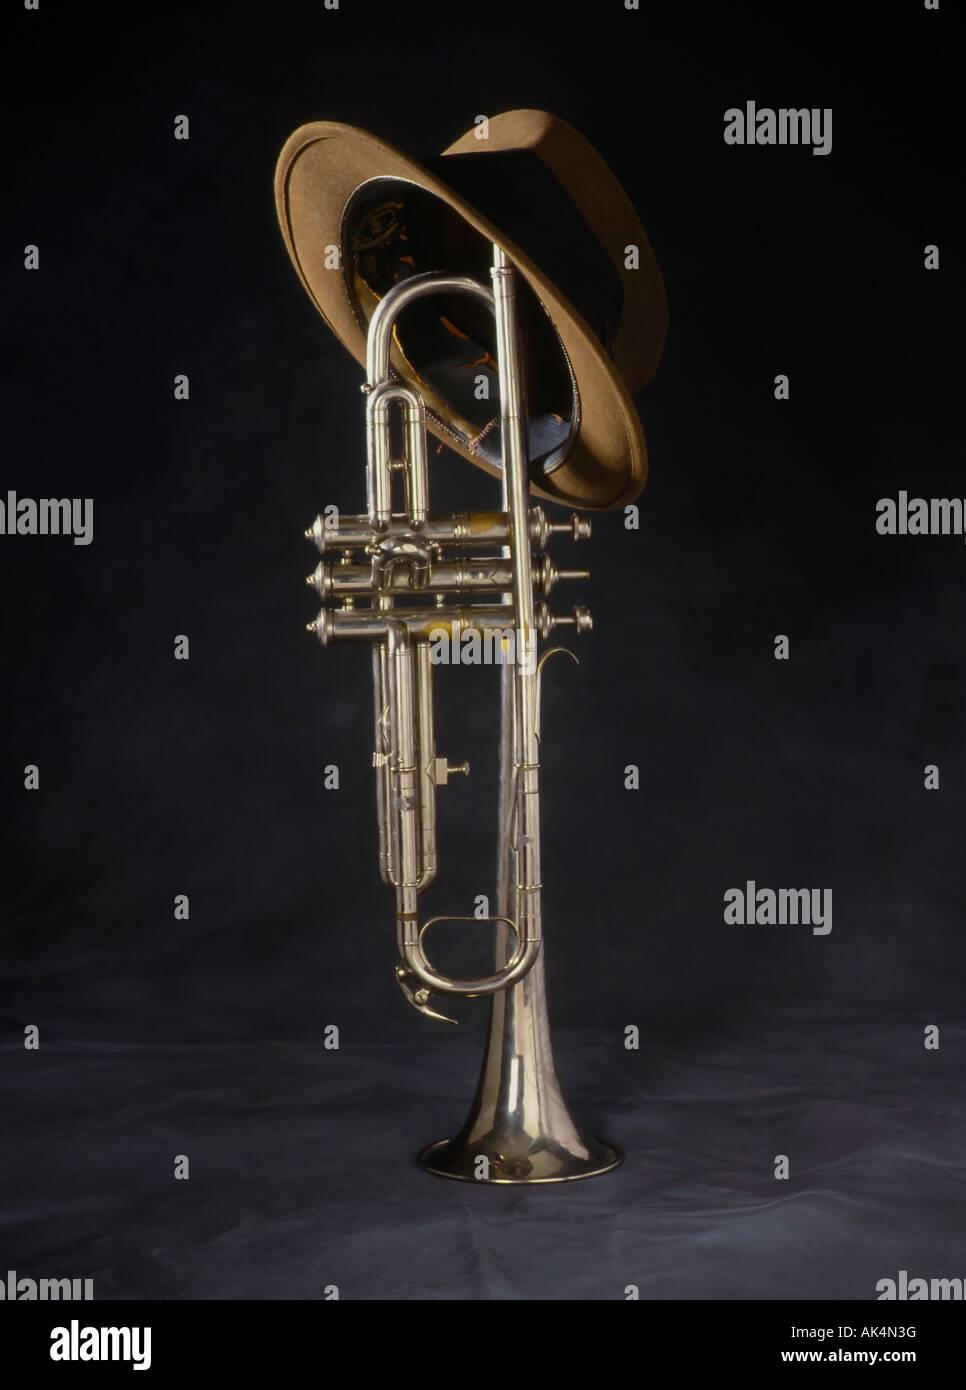 blues jazz horn - Stock Image